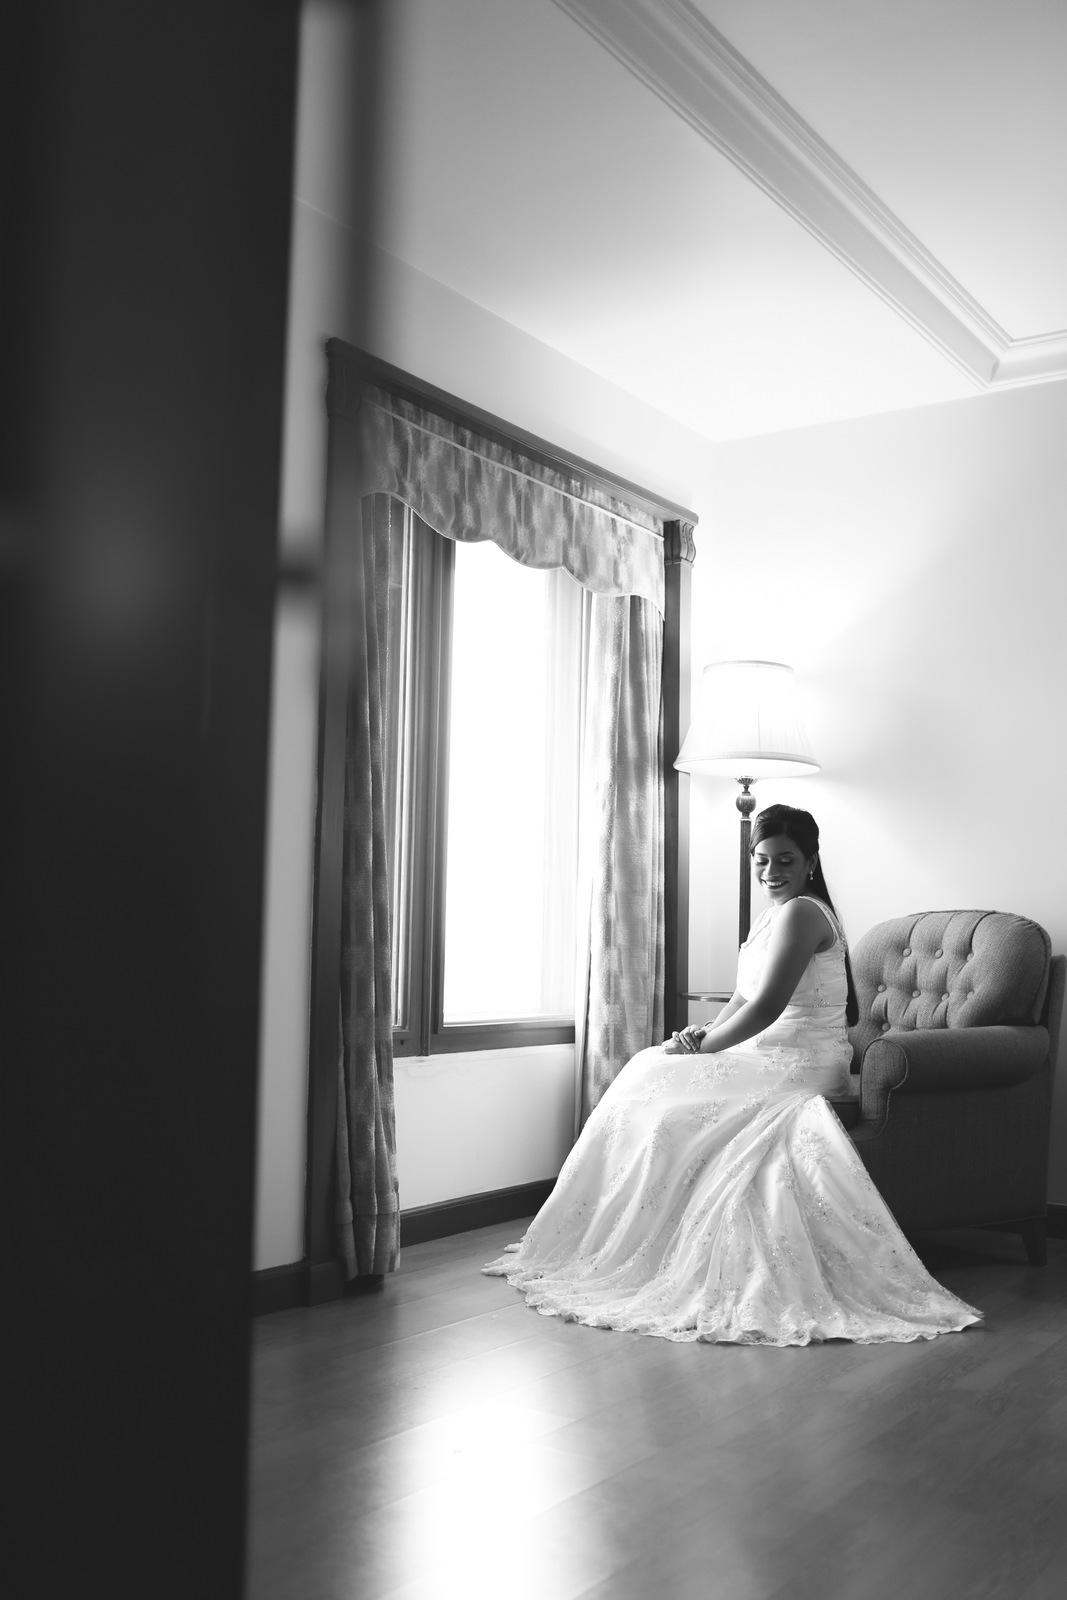 mumbai-wedding-into-candid-photography-rt-07.jpg